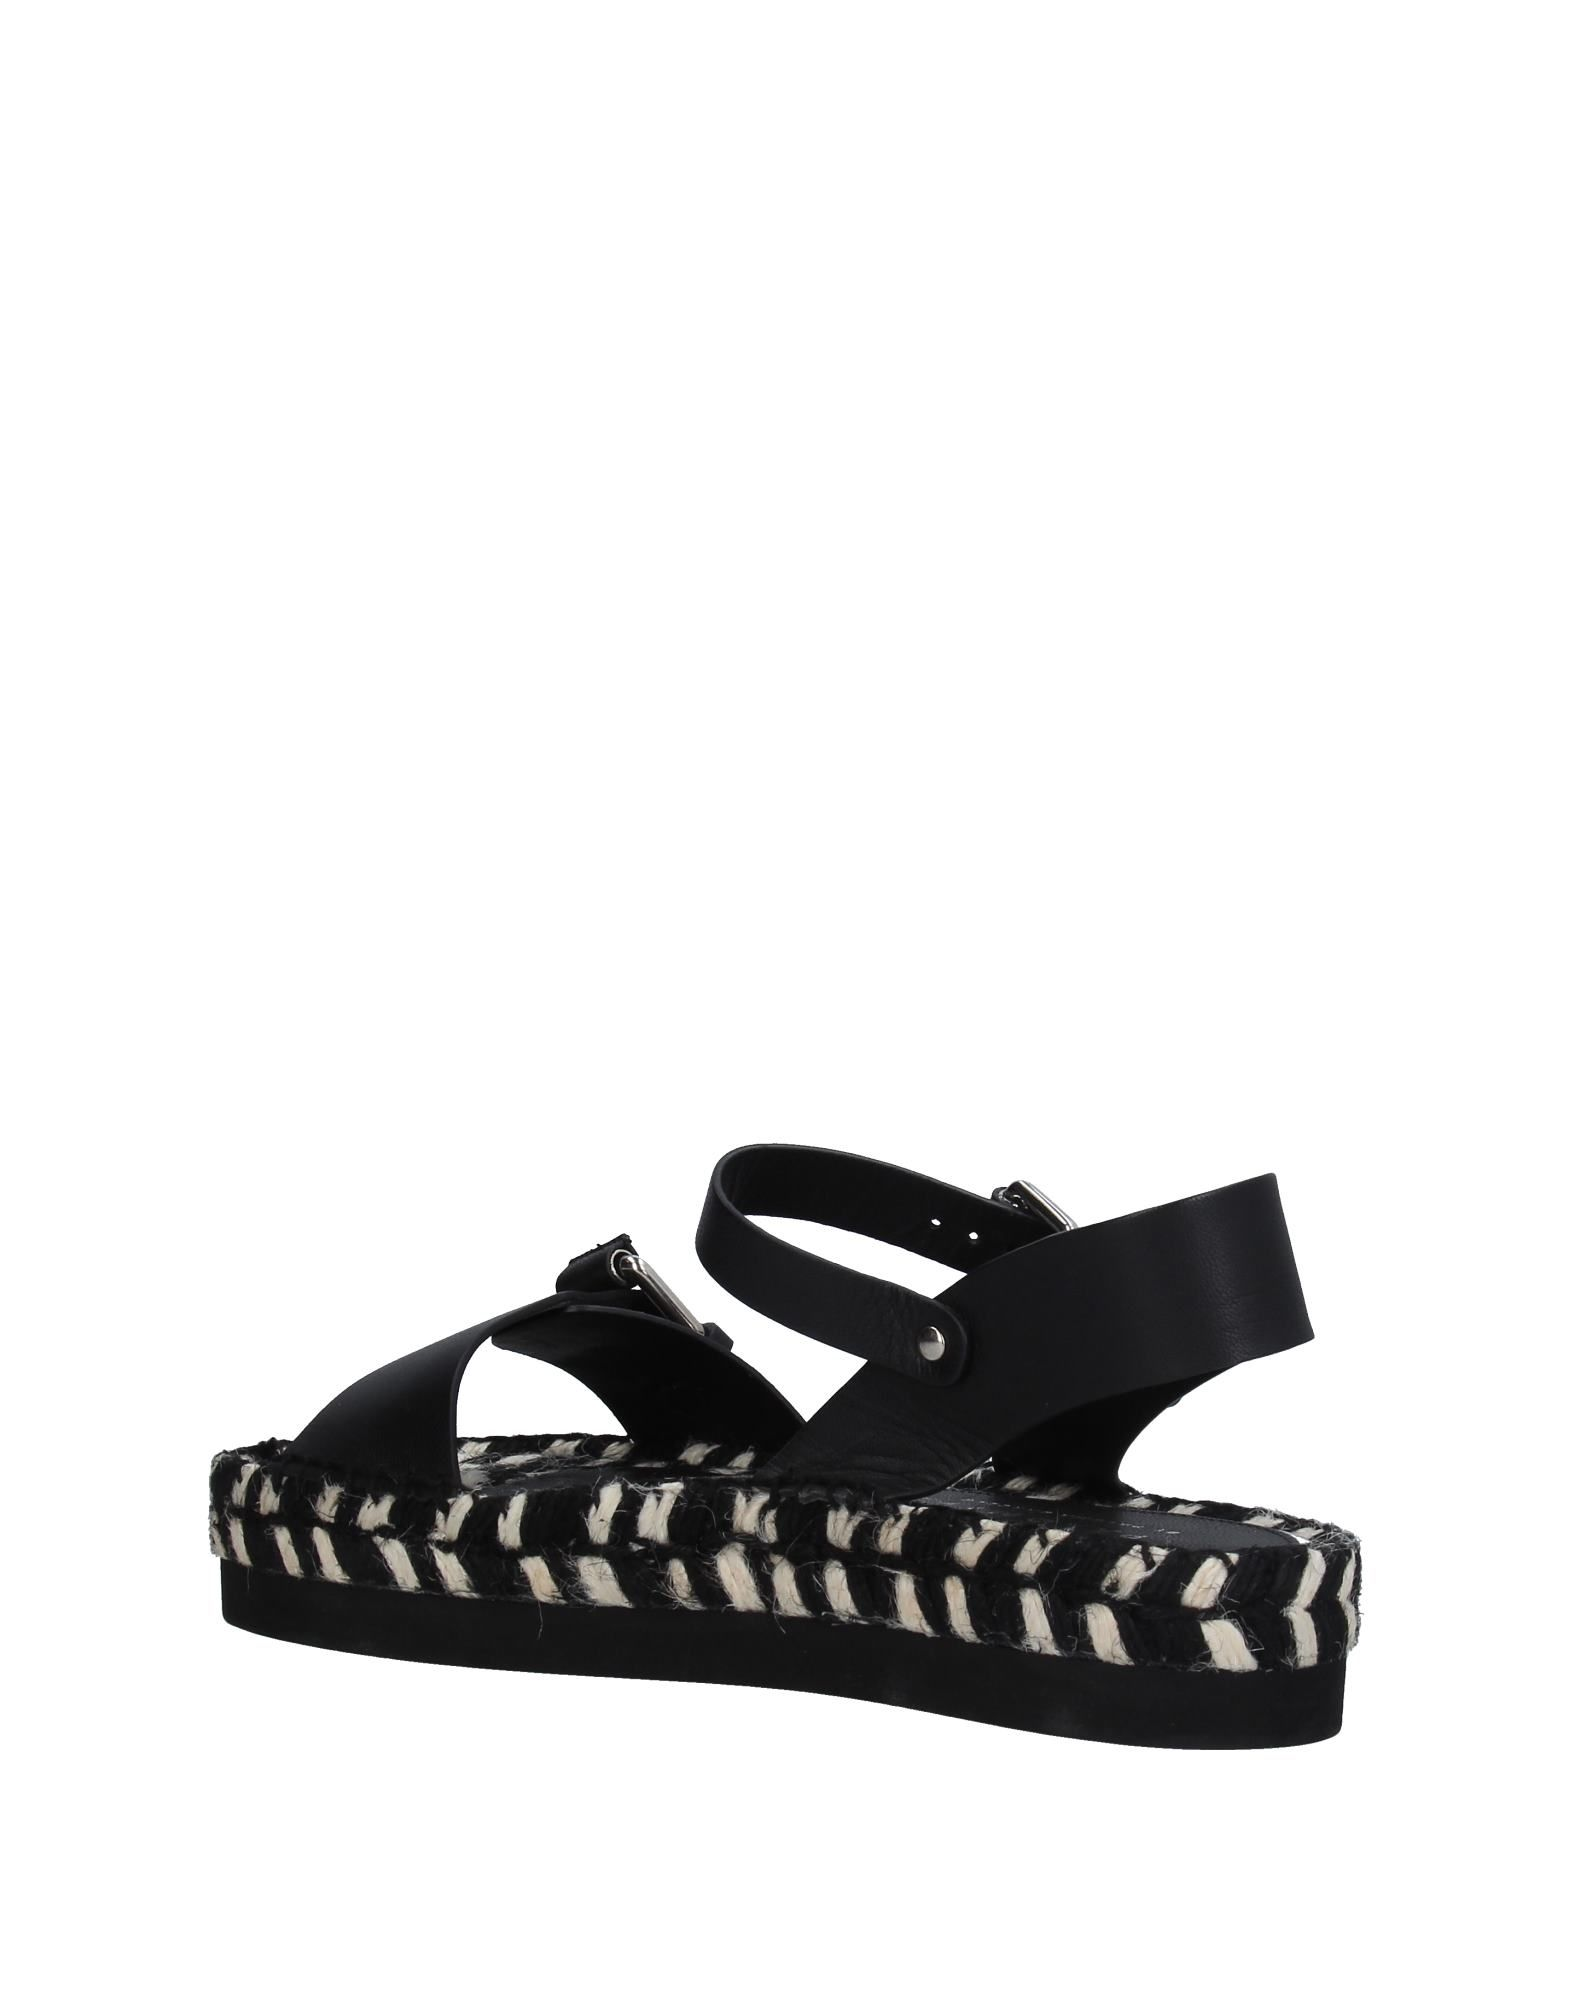 palomitas par paloma barcel & # 243; sandales - - - femmes palomitas par paloma barcel & # 243; sandales en ligne sur canada - 11255437ol 531034